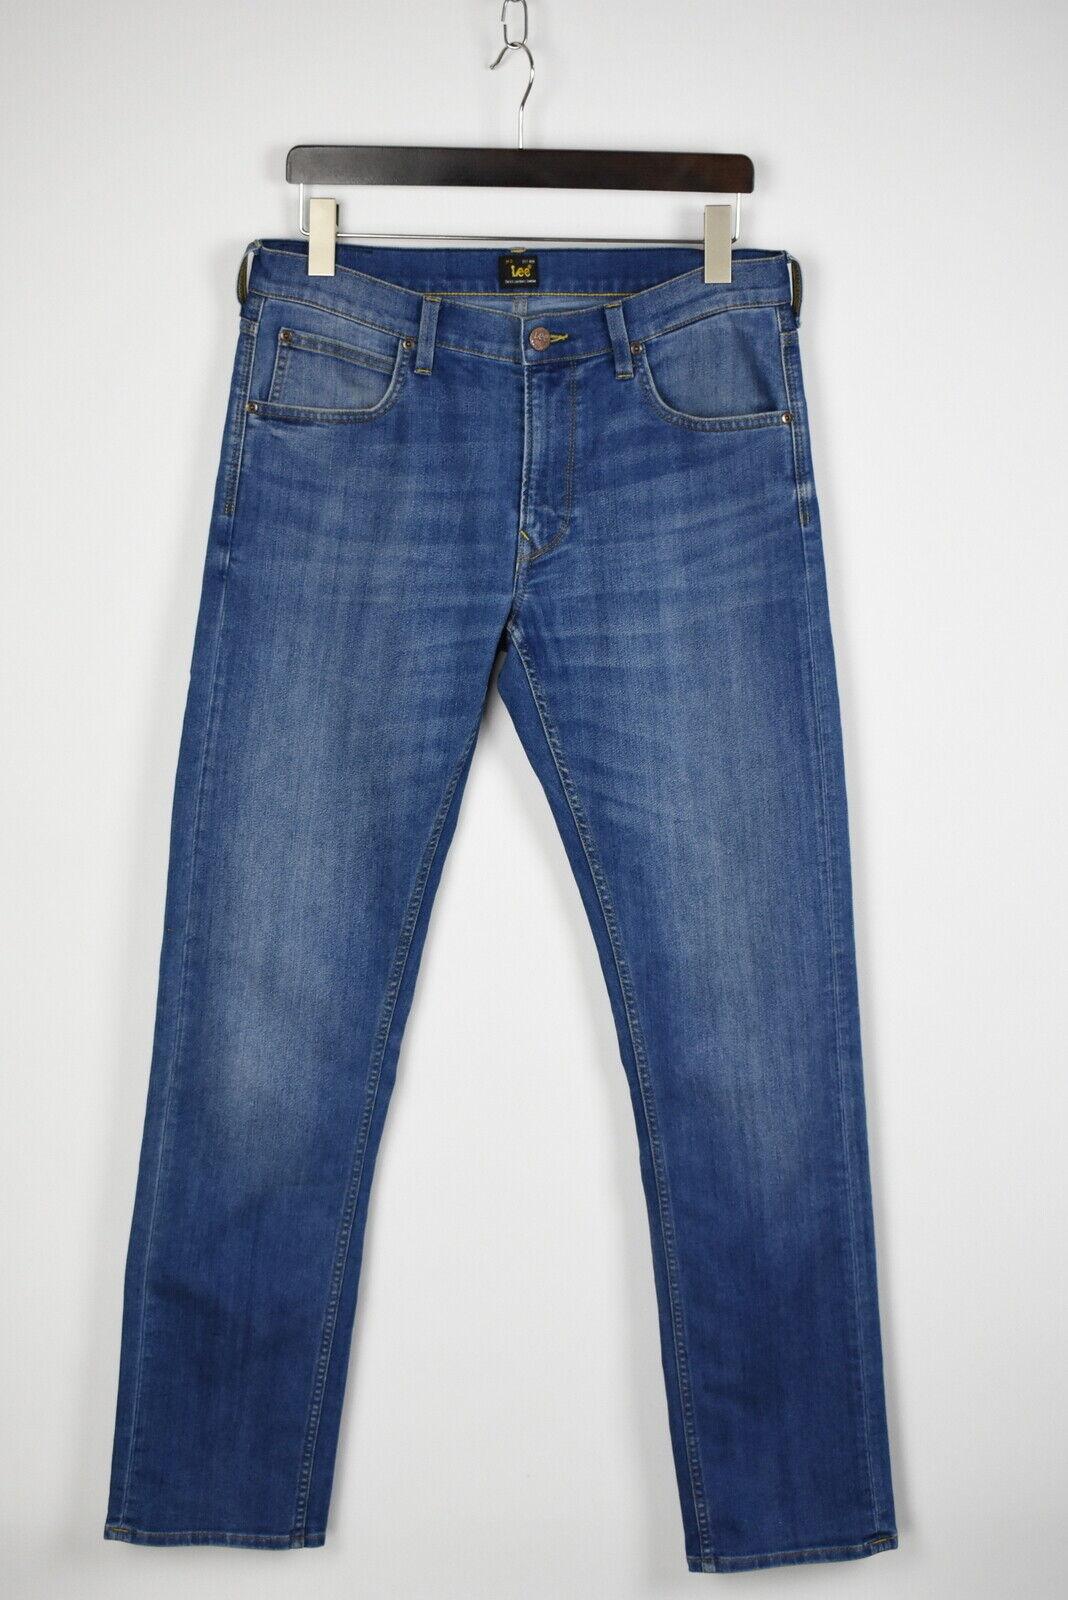 Lee Daren Zip Fly Herren W33/L34 Dehnbar Fade Effekt Blau Jeans 28828_ Js